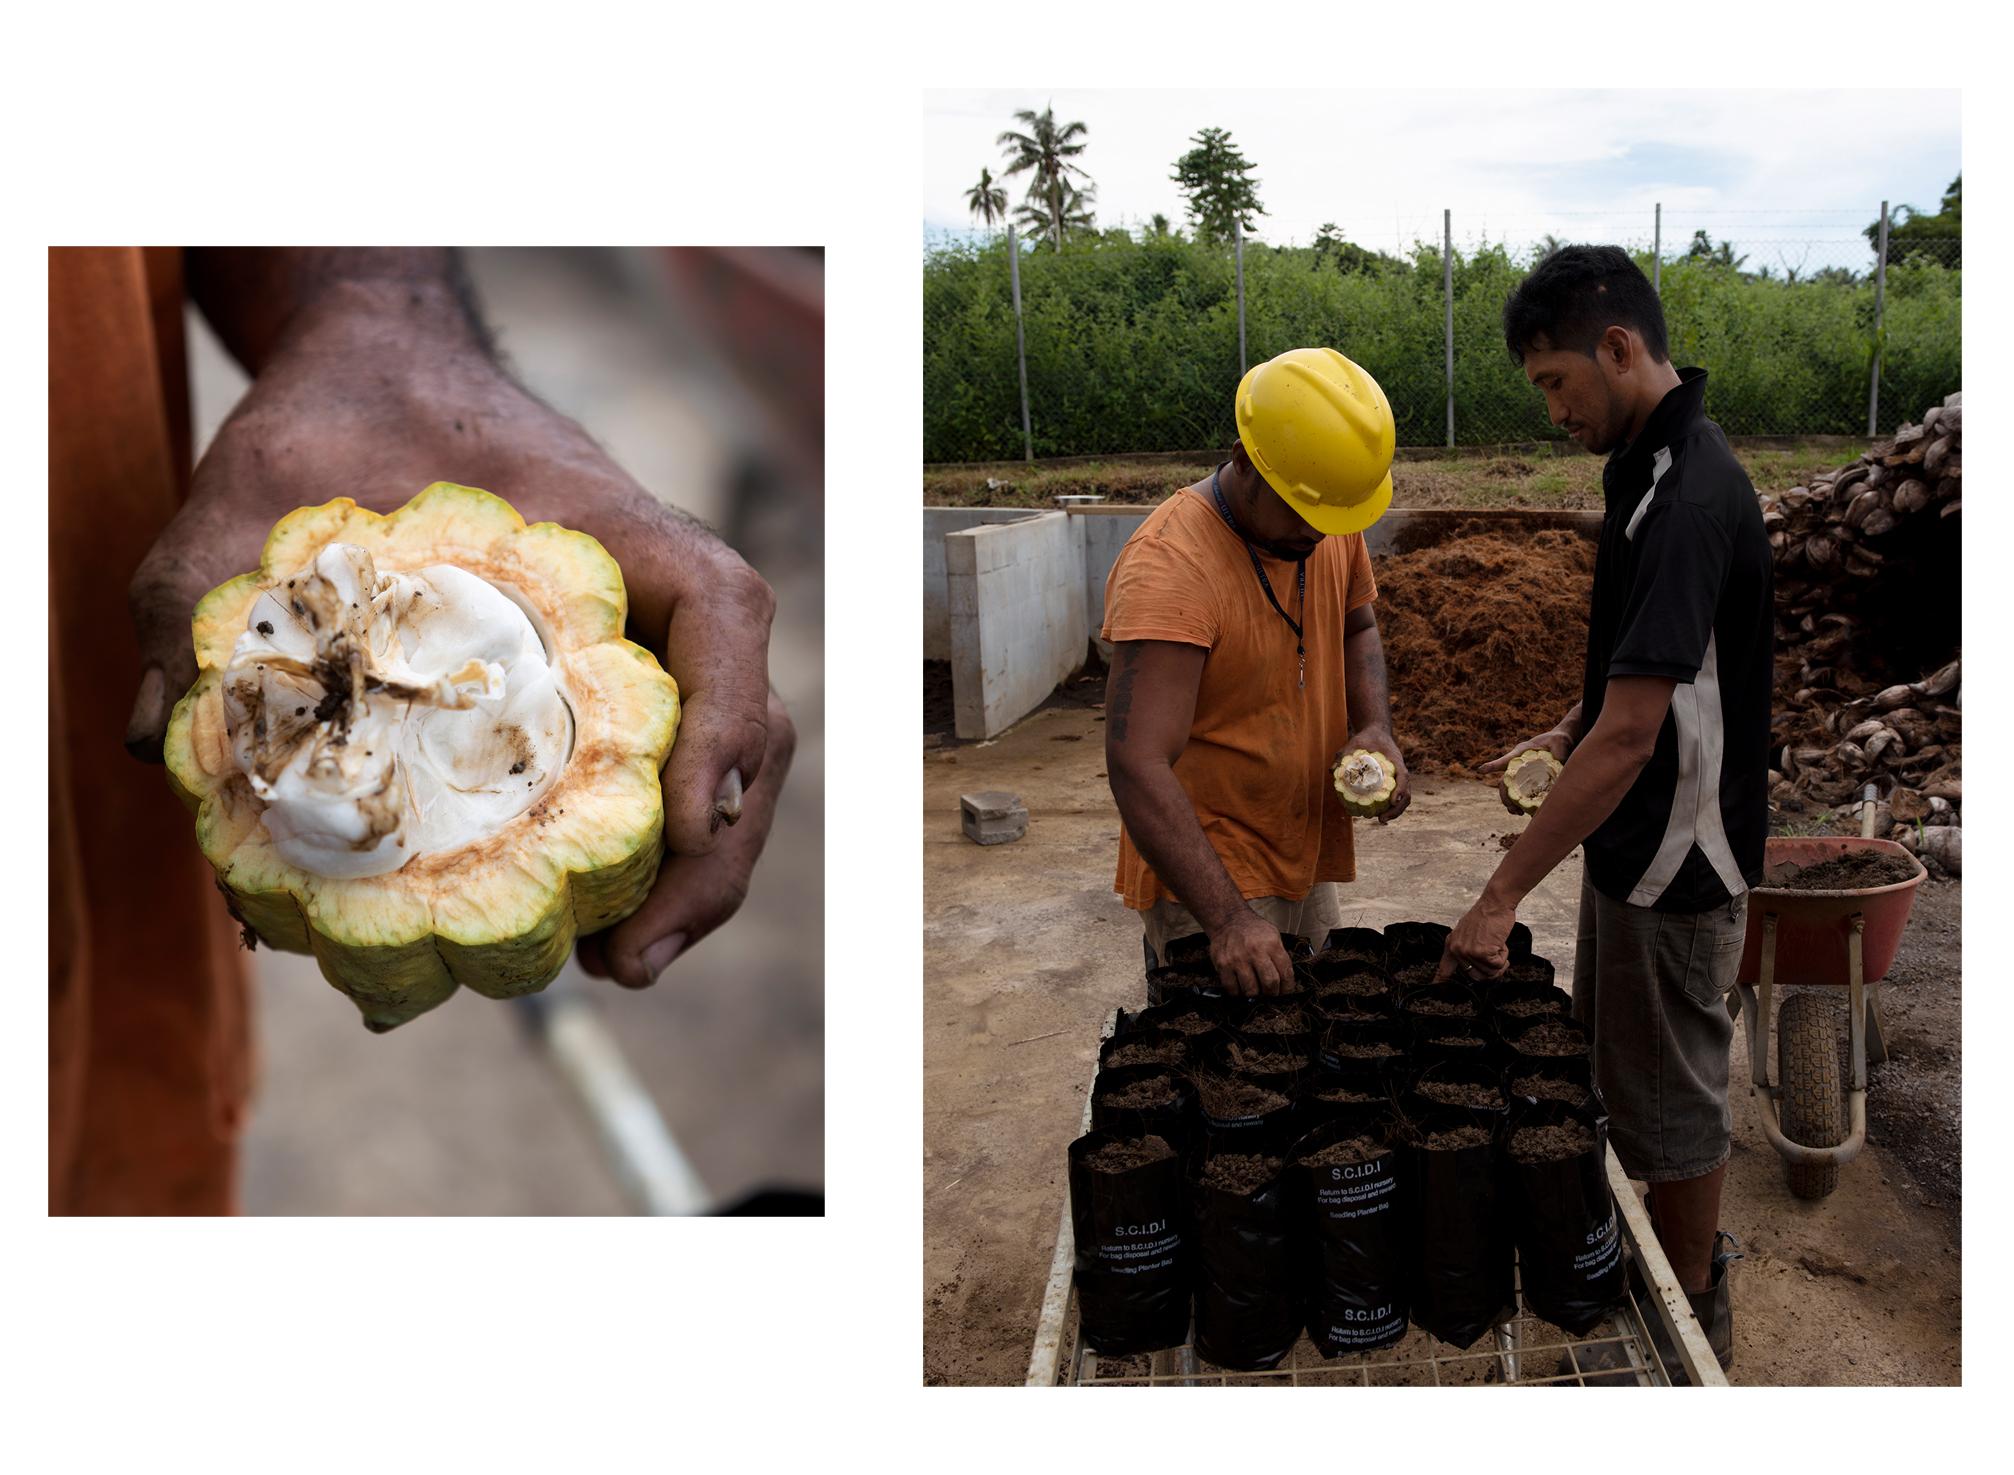 L:  Split koko pod  R:  Feuu Sio Afisulu & Tile To'a planting koko seeds